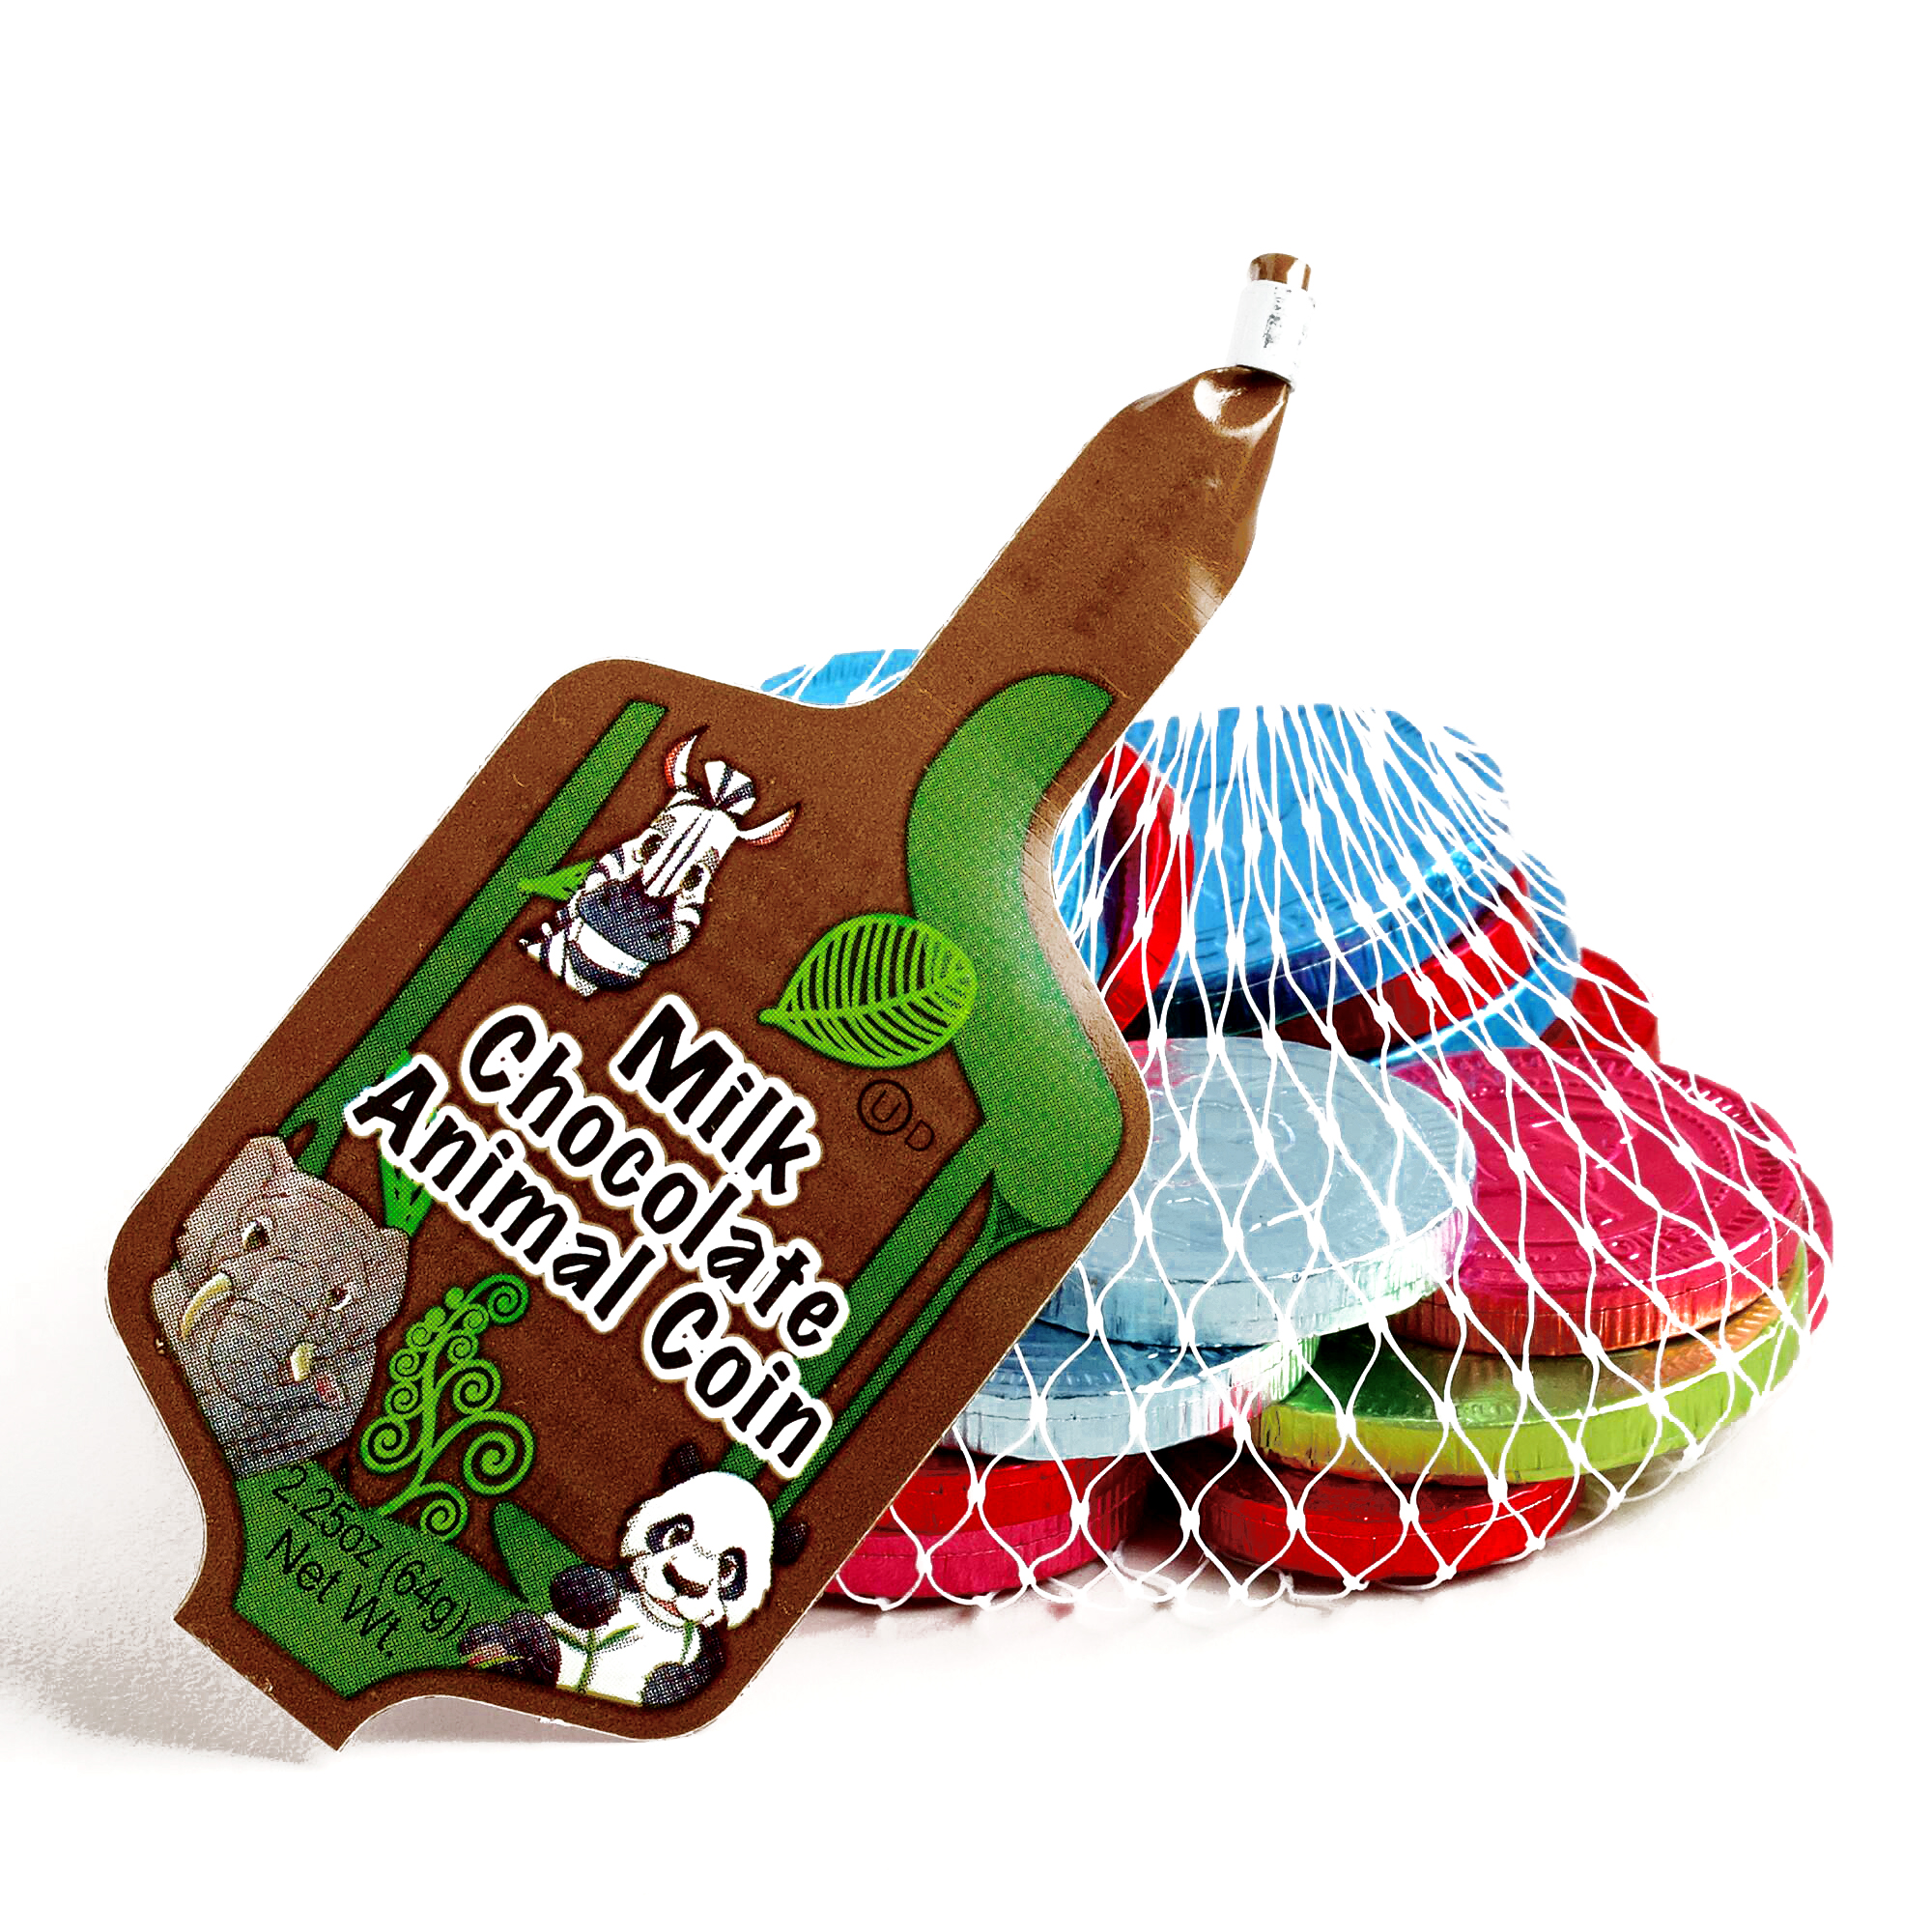 Steenland Mesh Bag of Chocolate Animal Coins  4 oz each (...